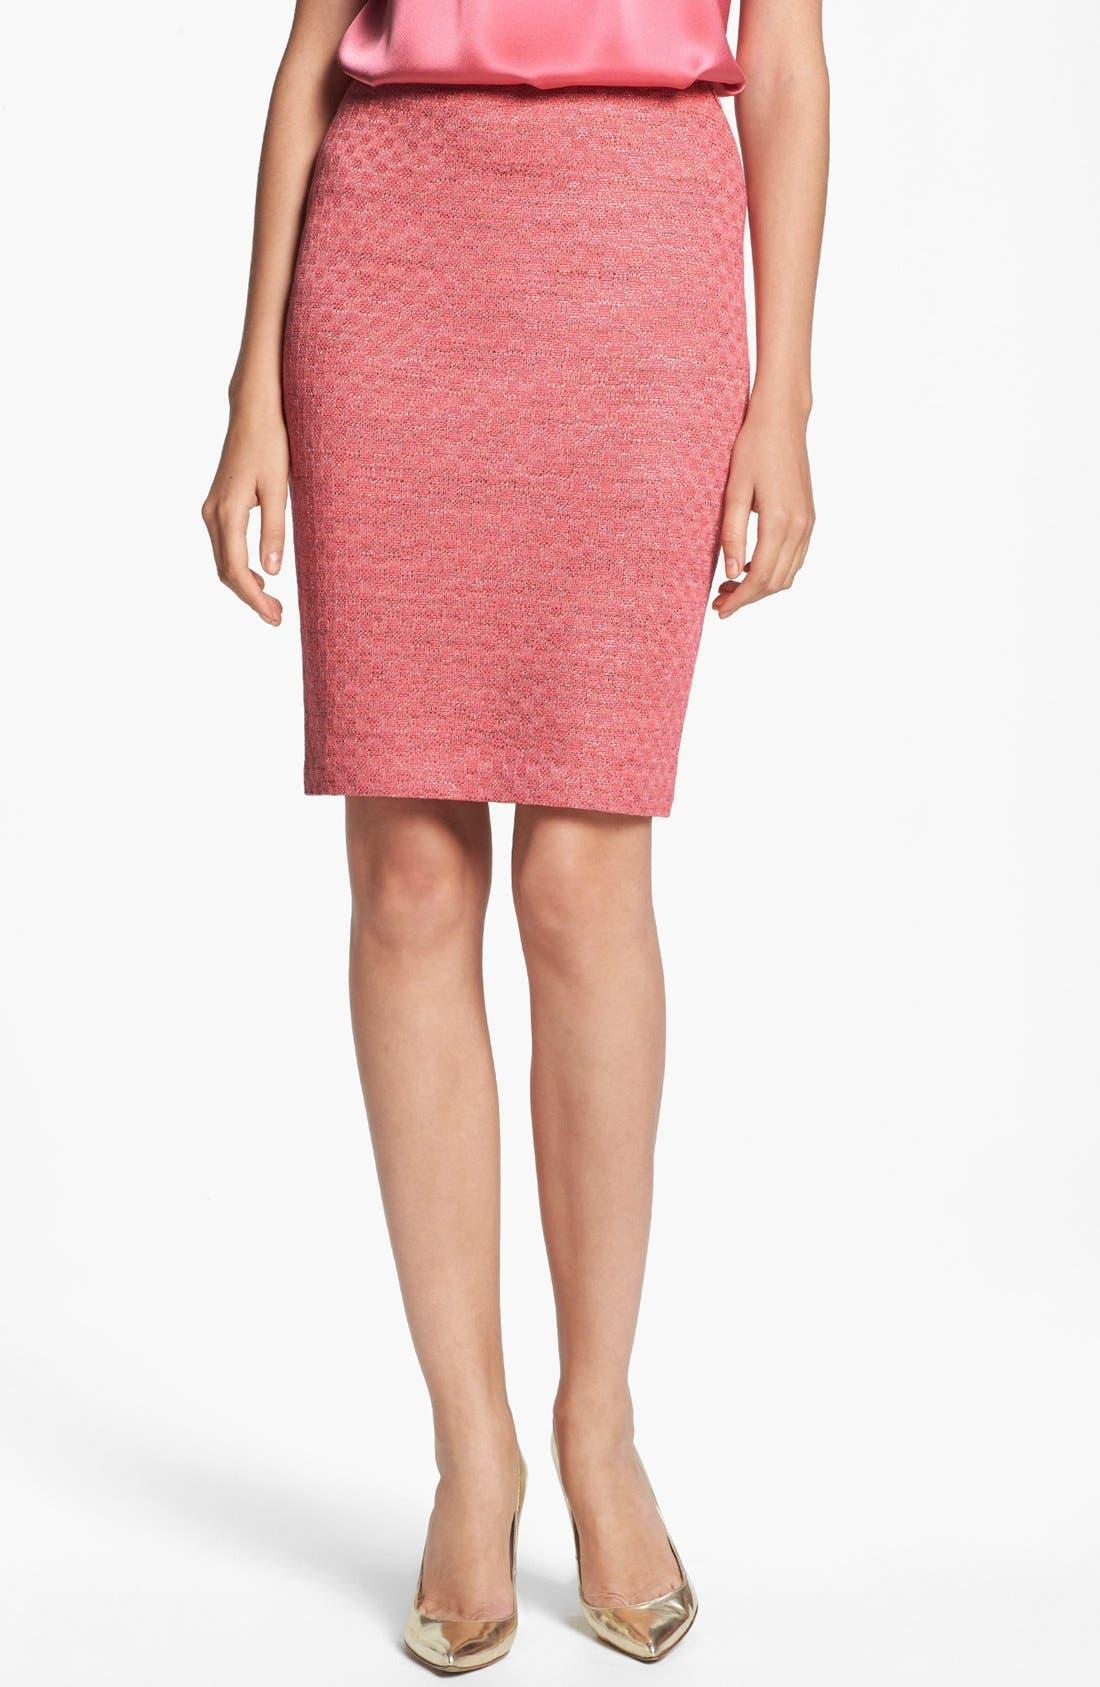 ST. JOHN COLLECTION Damier Knit Pencil Skirt, Main, color, 950